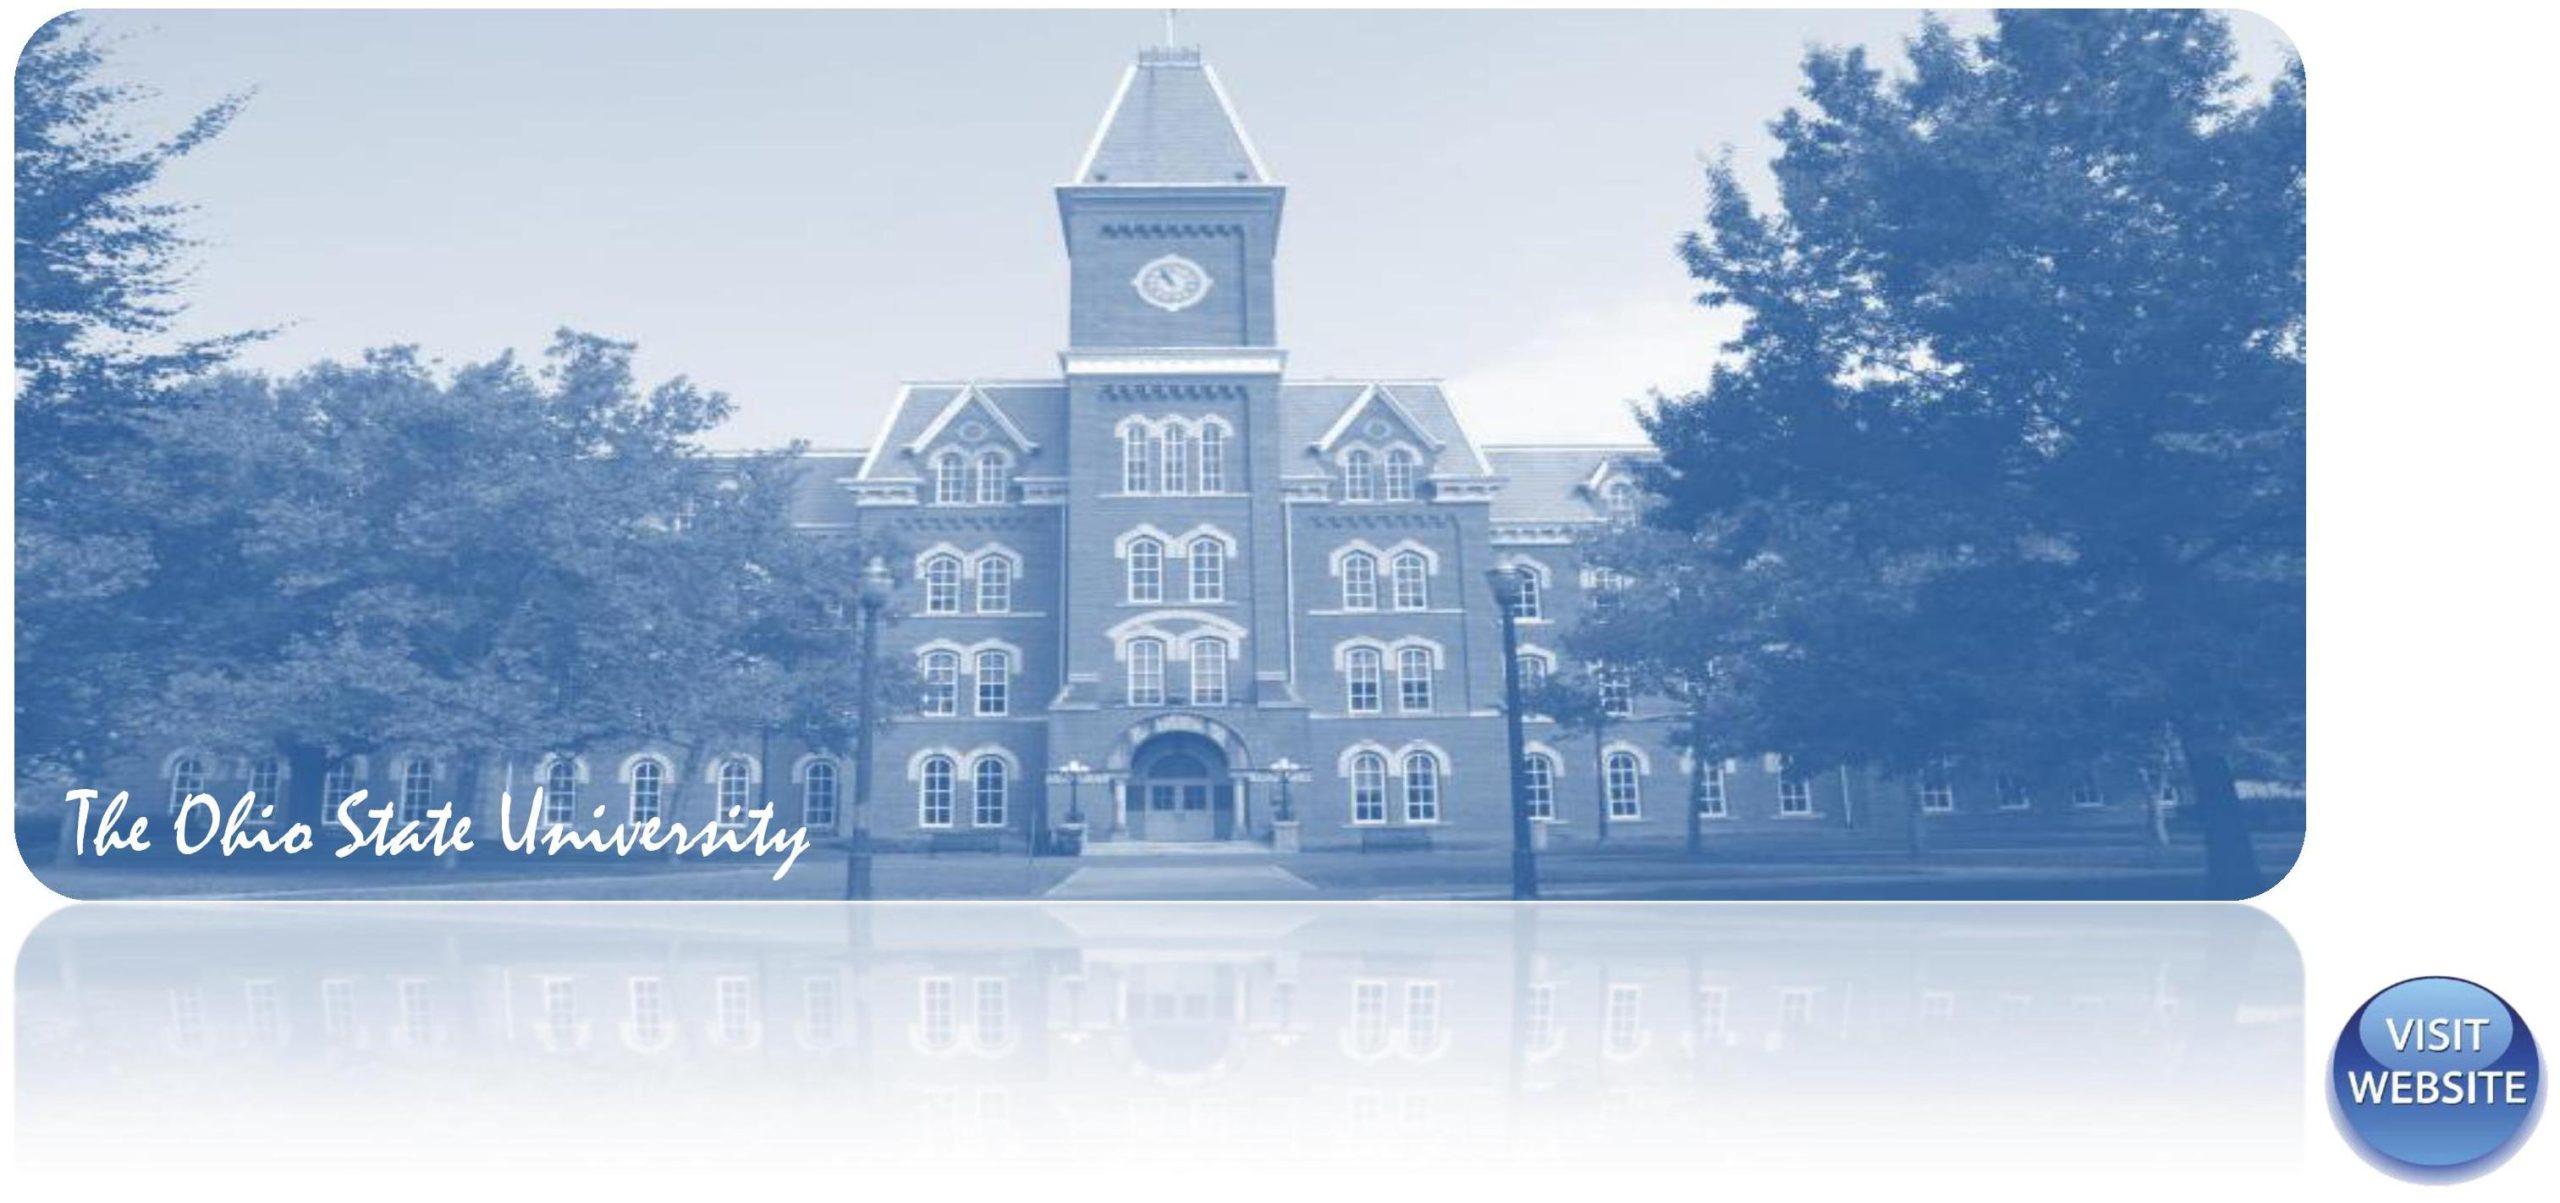 The Ohio State University USA